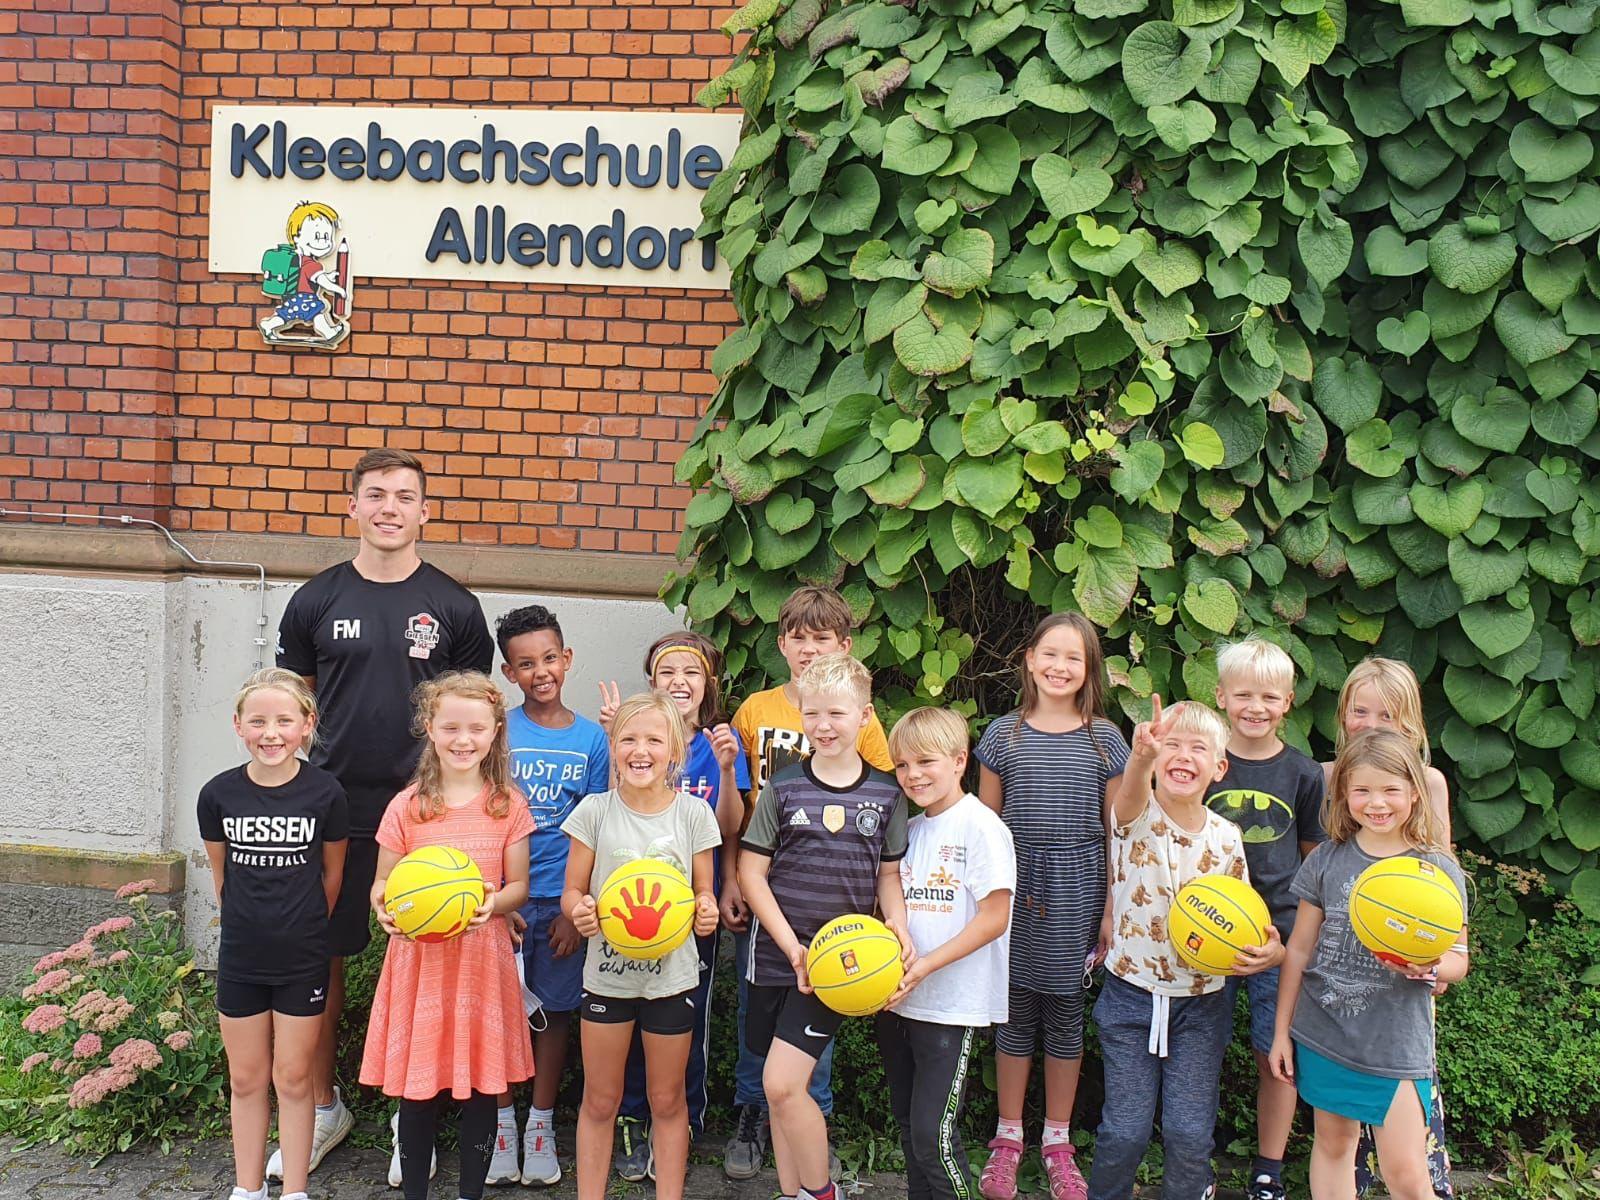 AG Kleebachschule Allendorf